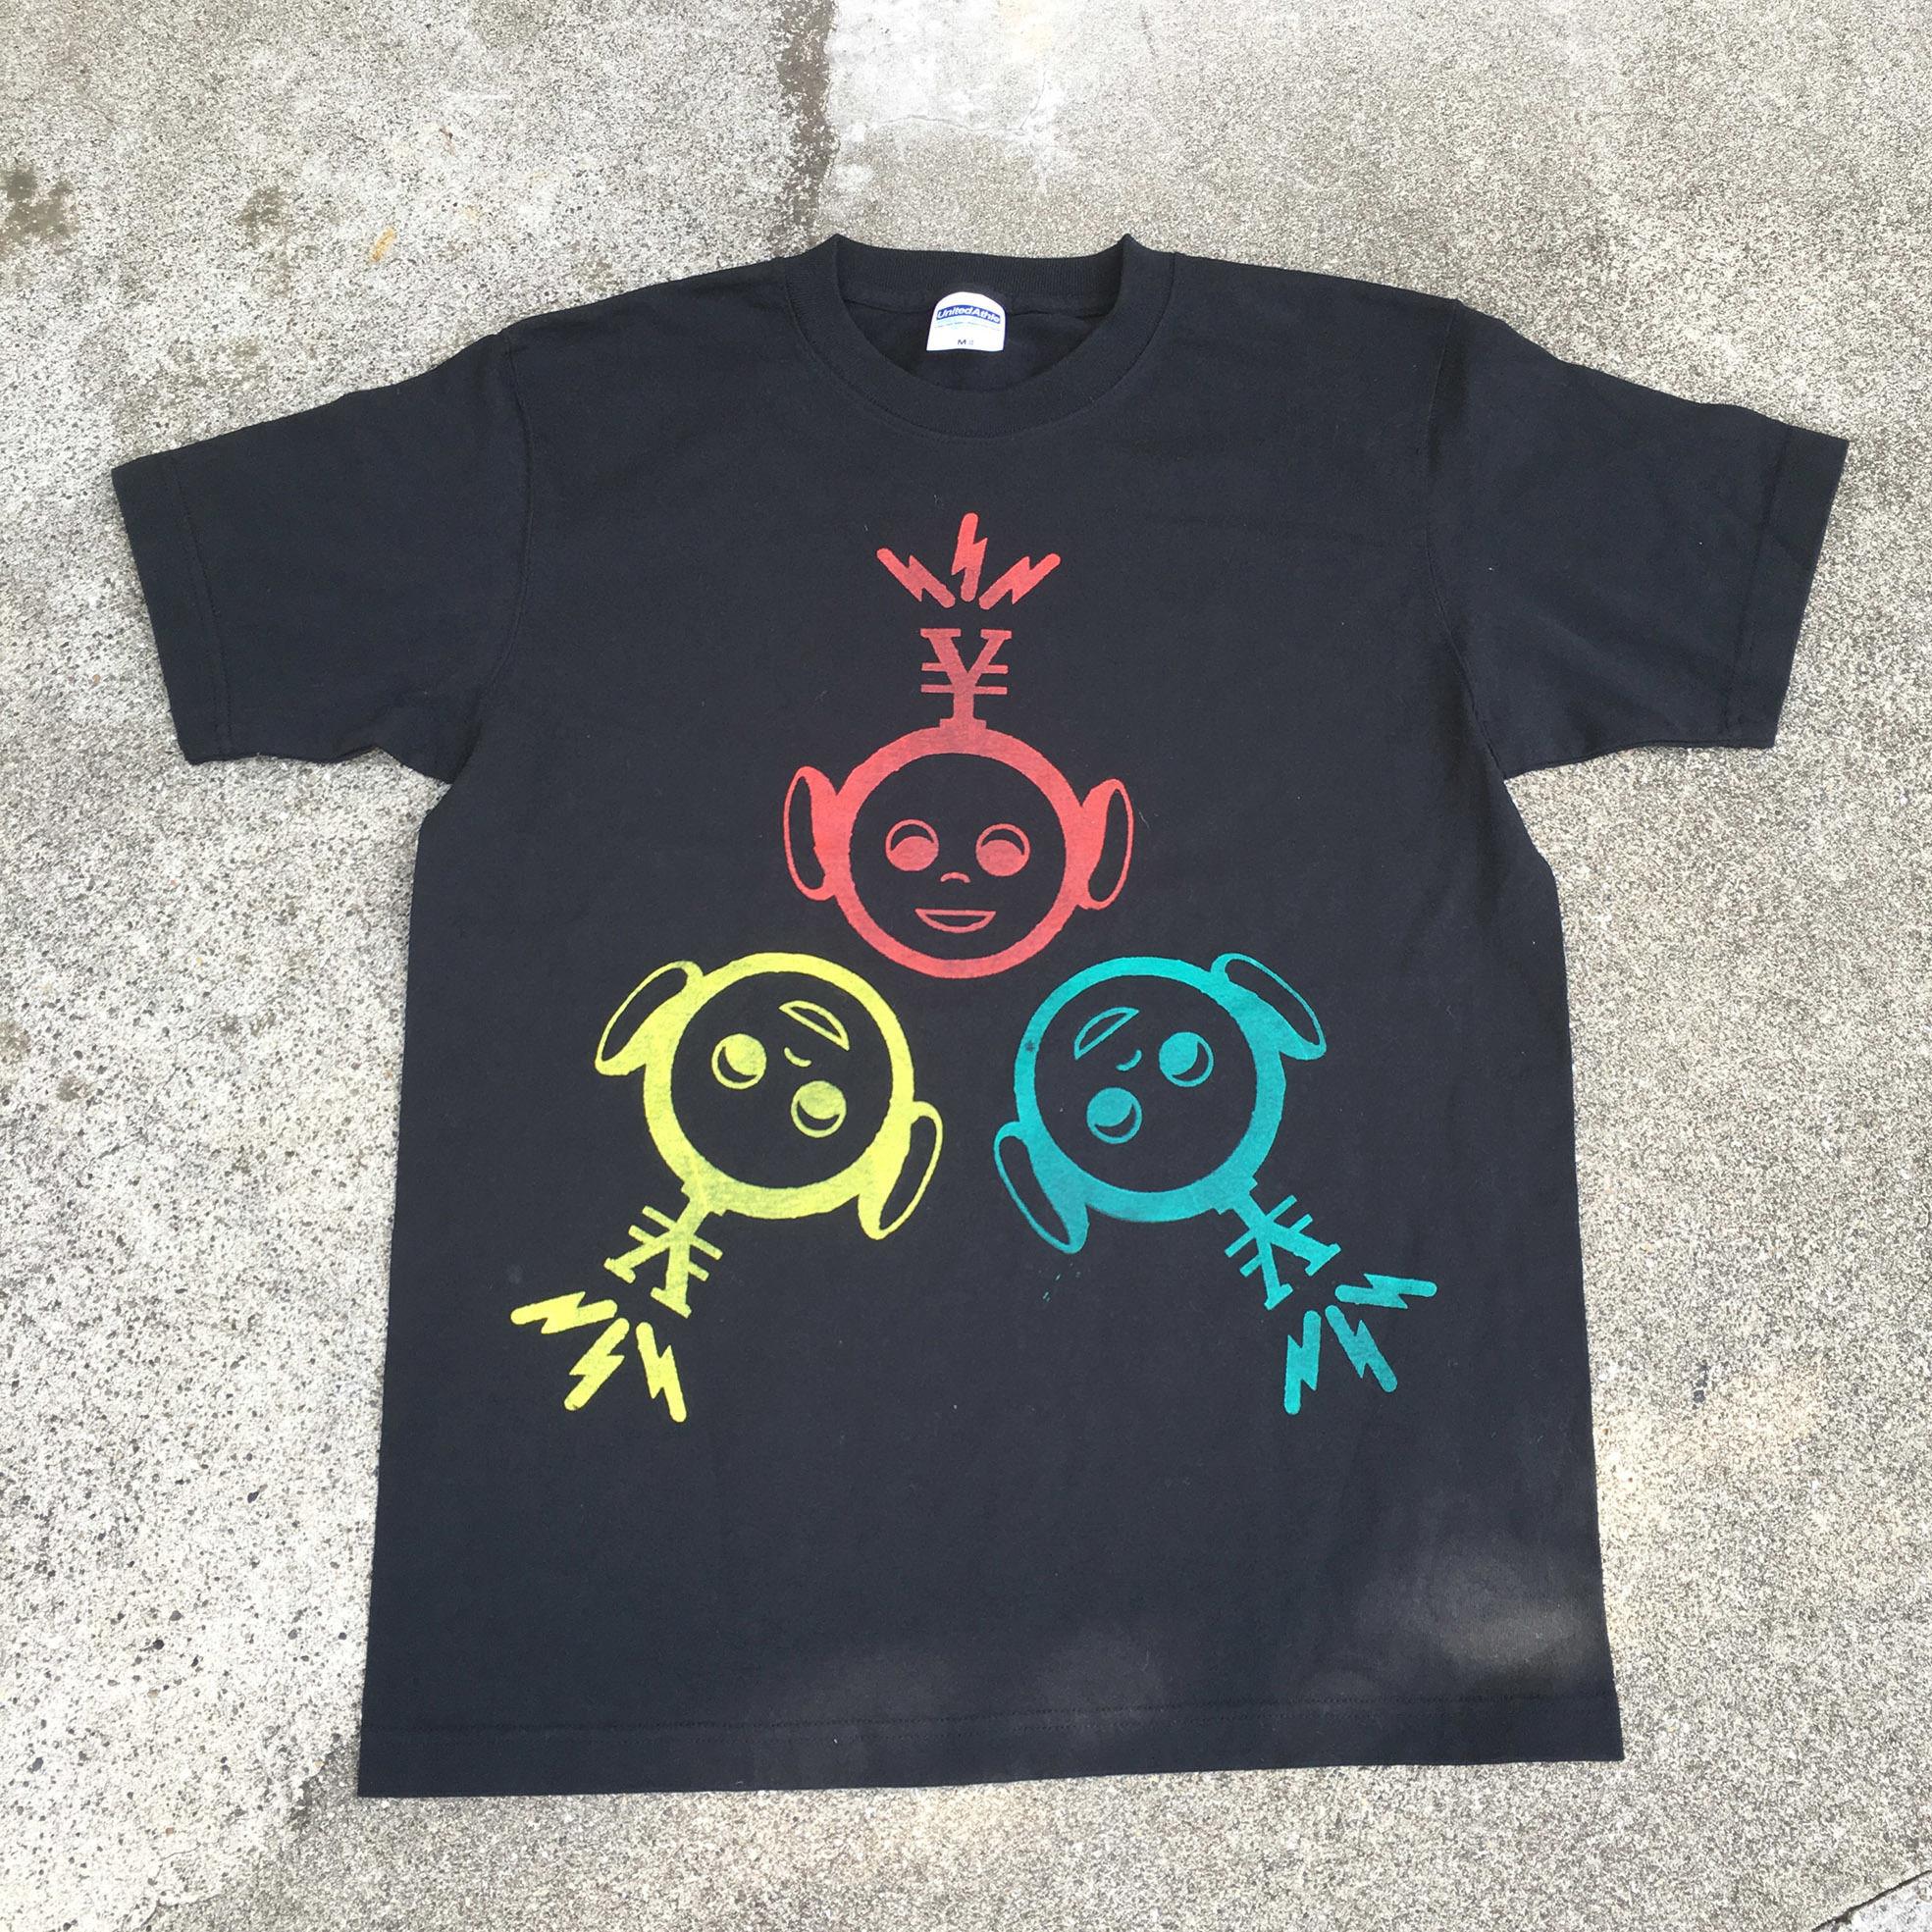 Bootleg Teletubbies T Shirts/ブートレグ テレタビーズ Tシャツ/180603-1